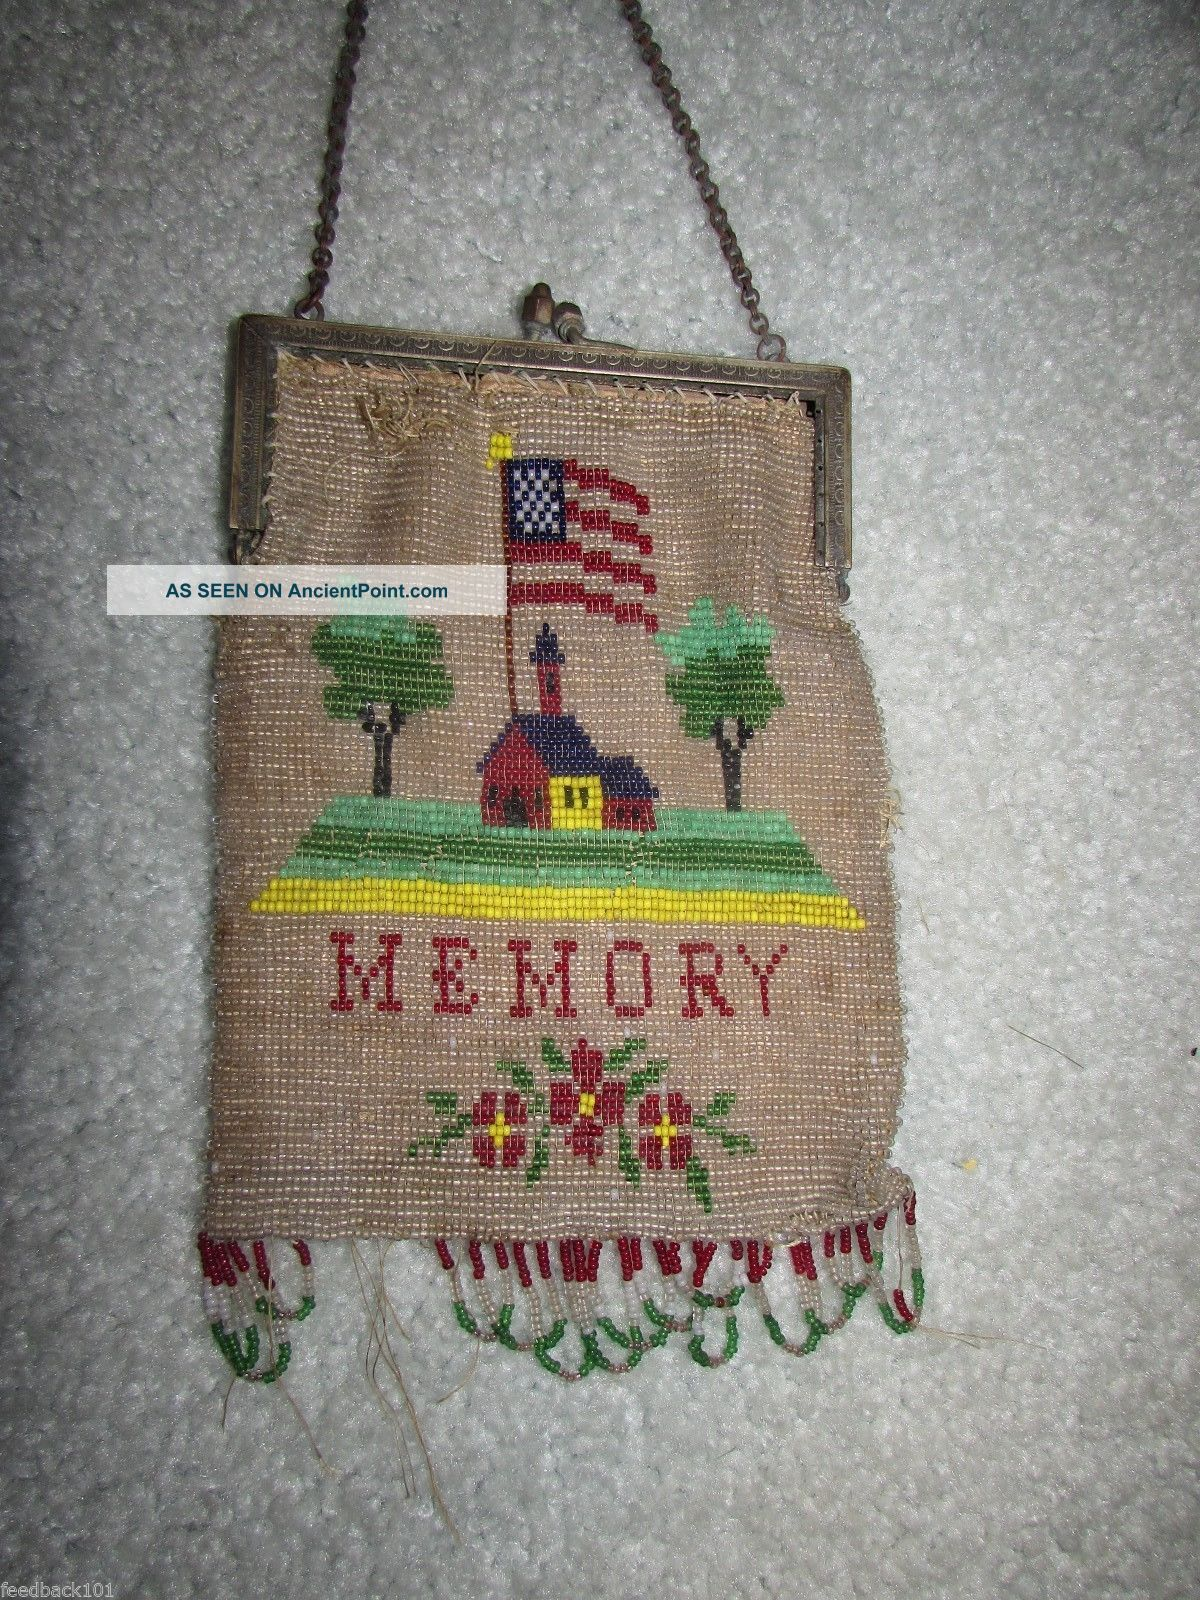 Antique Beaded Purse 18 Stars 1812 - 1816 Rare Pictorial Handbag War Time Bag Other photo